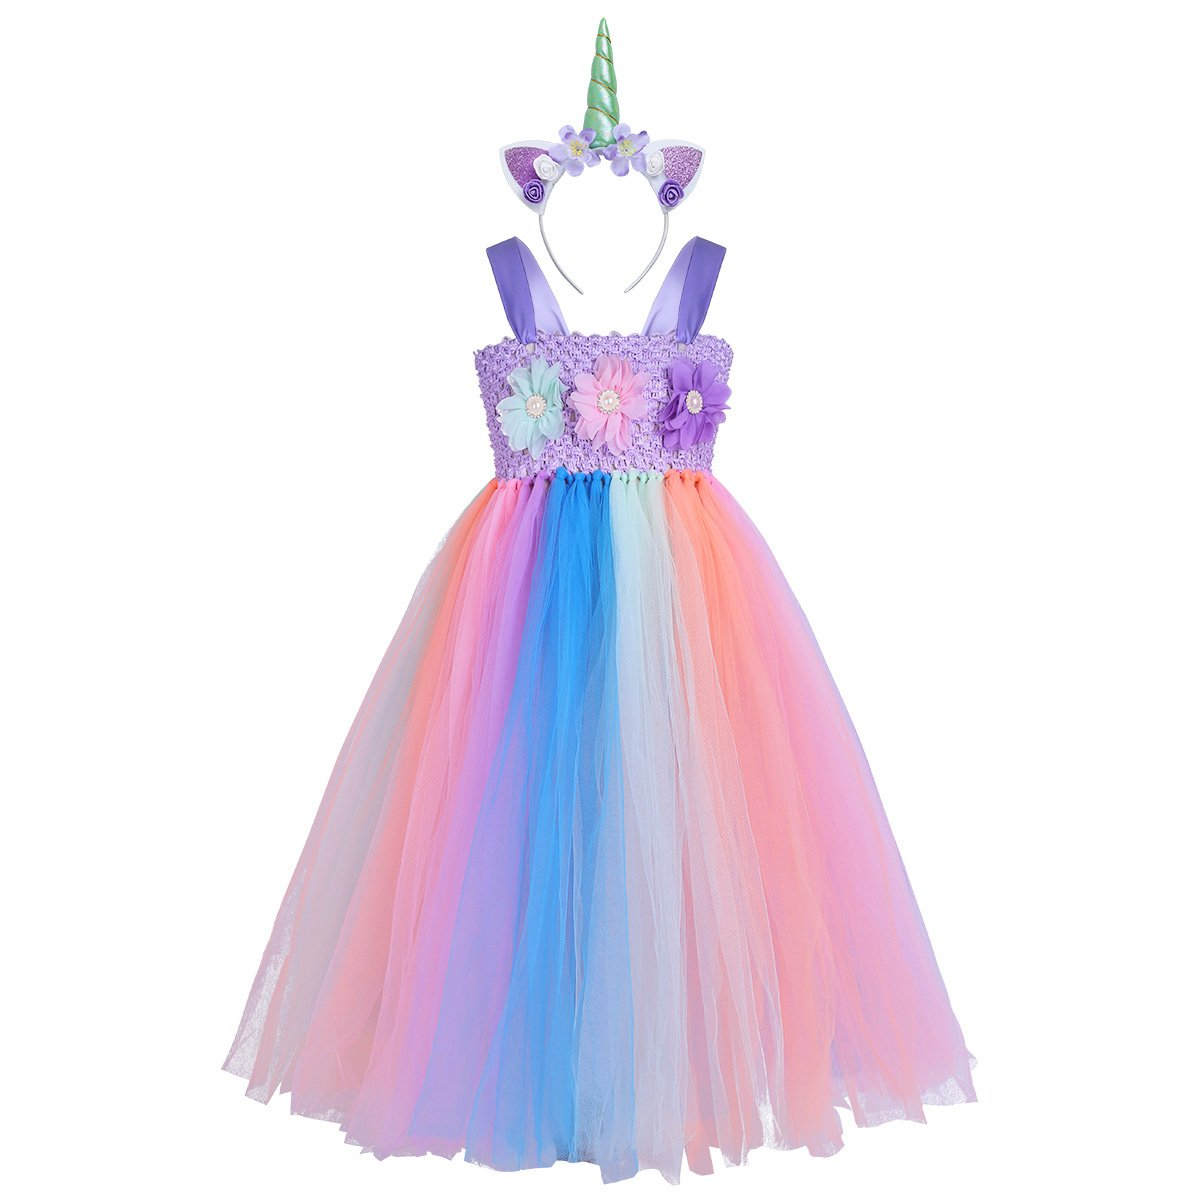 FEESHOW Kids Girls Rainbow Train Tutu Dress with Headband Party Outfit Easter Fancy Dress up Costumes Purple Rainbow 7-8